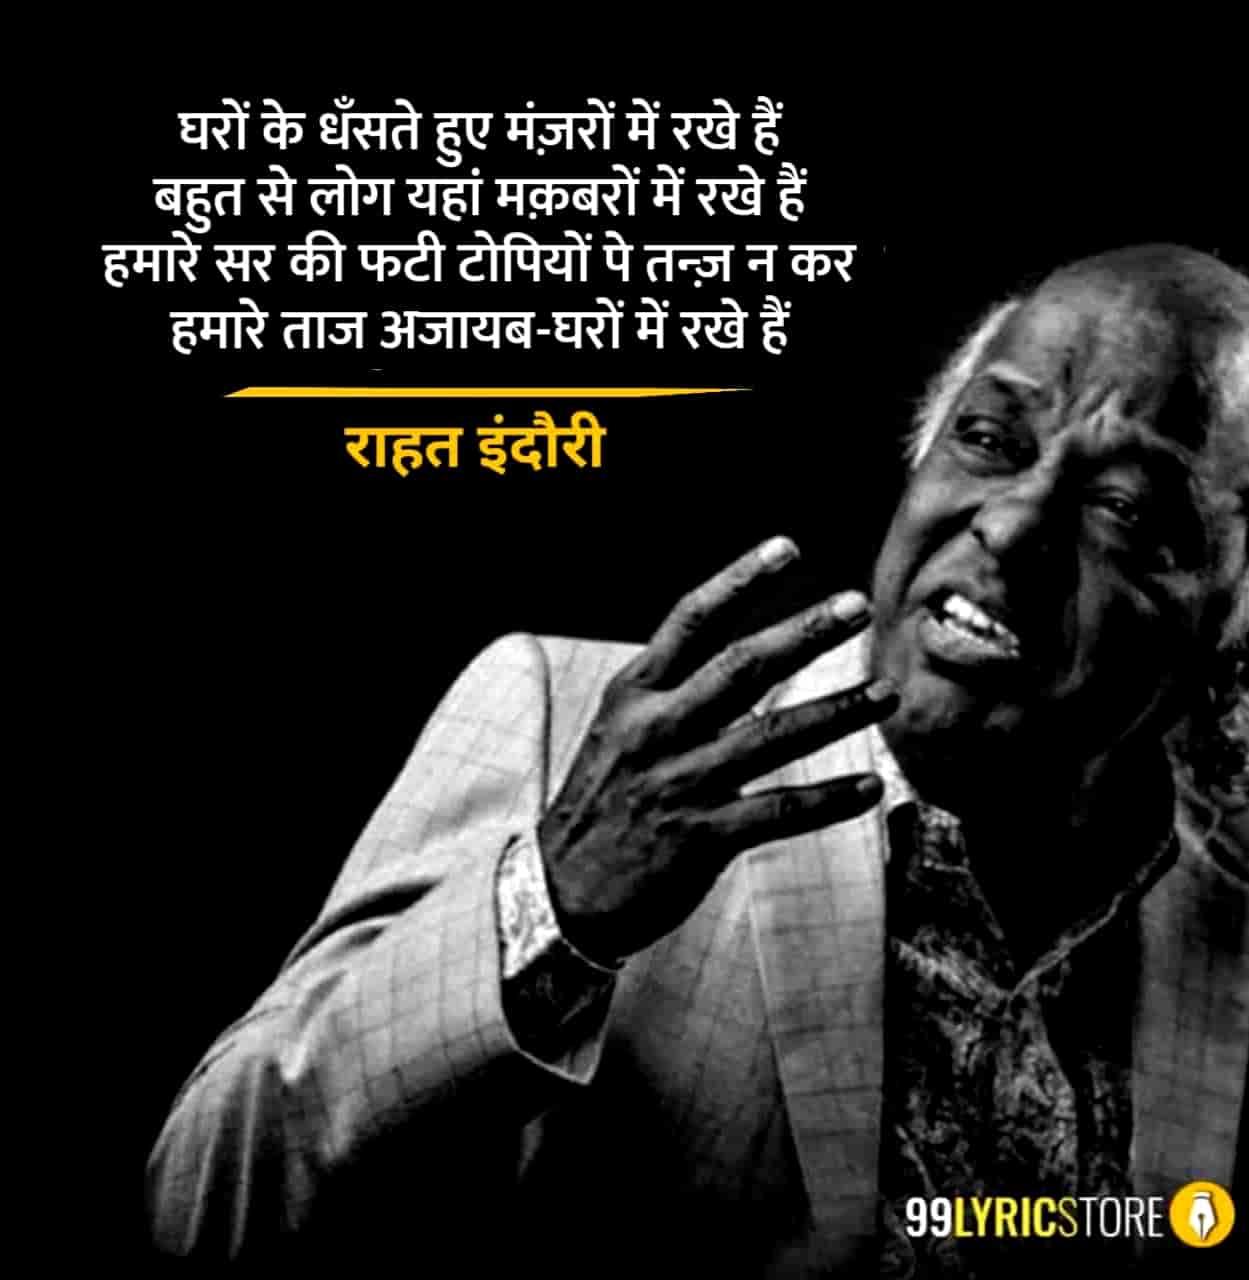 This beautiful shayari 'Hamare Taj Ajaayabgharon Mein Rakhe Hain' has written and performed by Dr Rahat Indori.